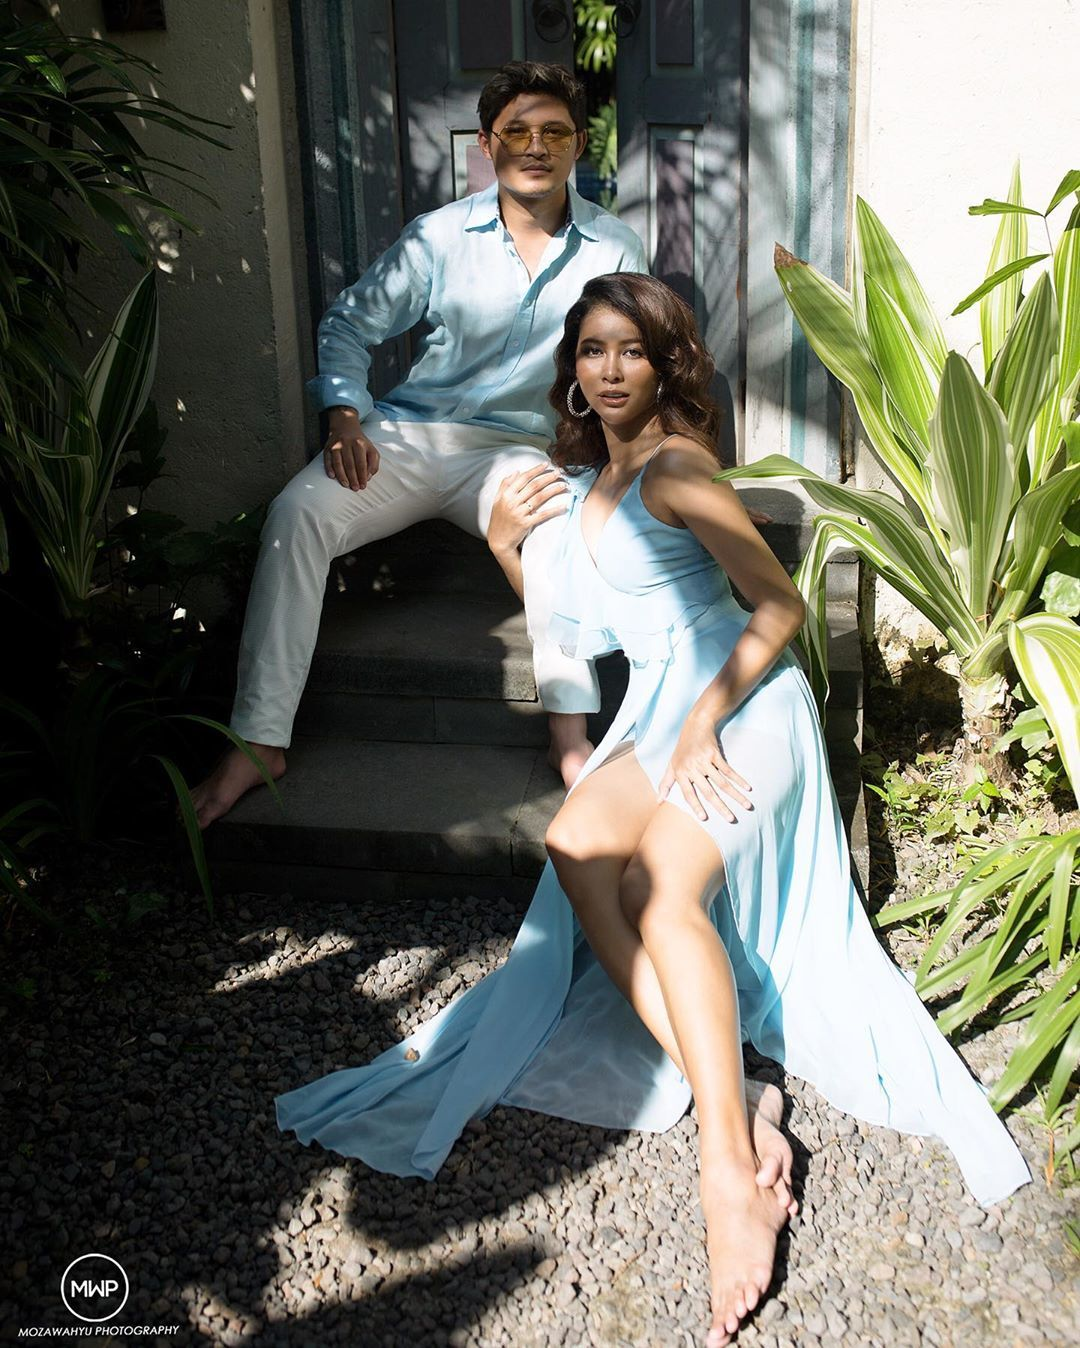 Segera Menikah, Bunga Jelitha & Syamsir Alam Lakukan Foto Pre-Wedding